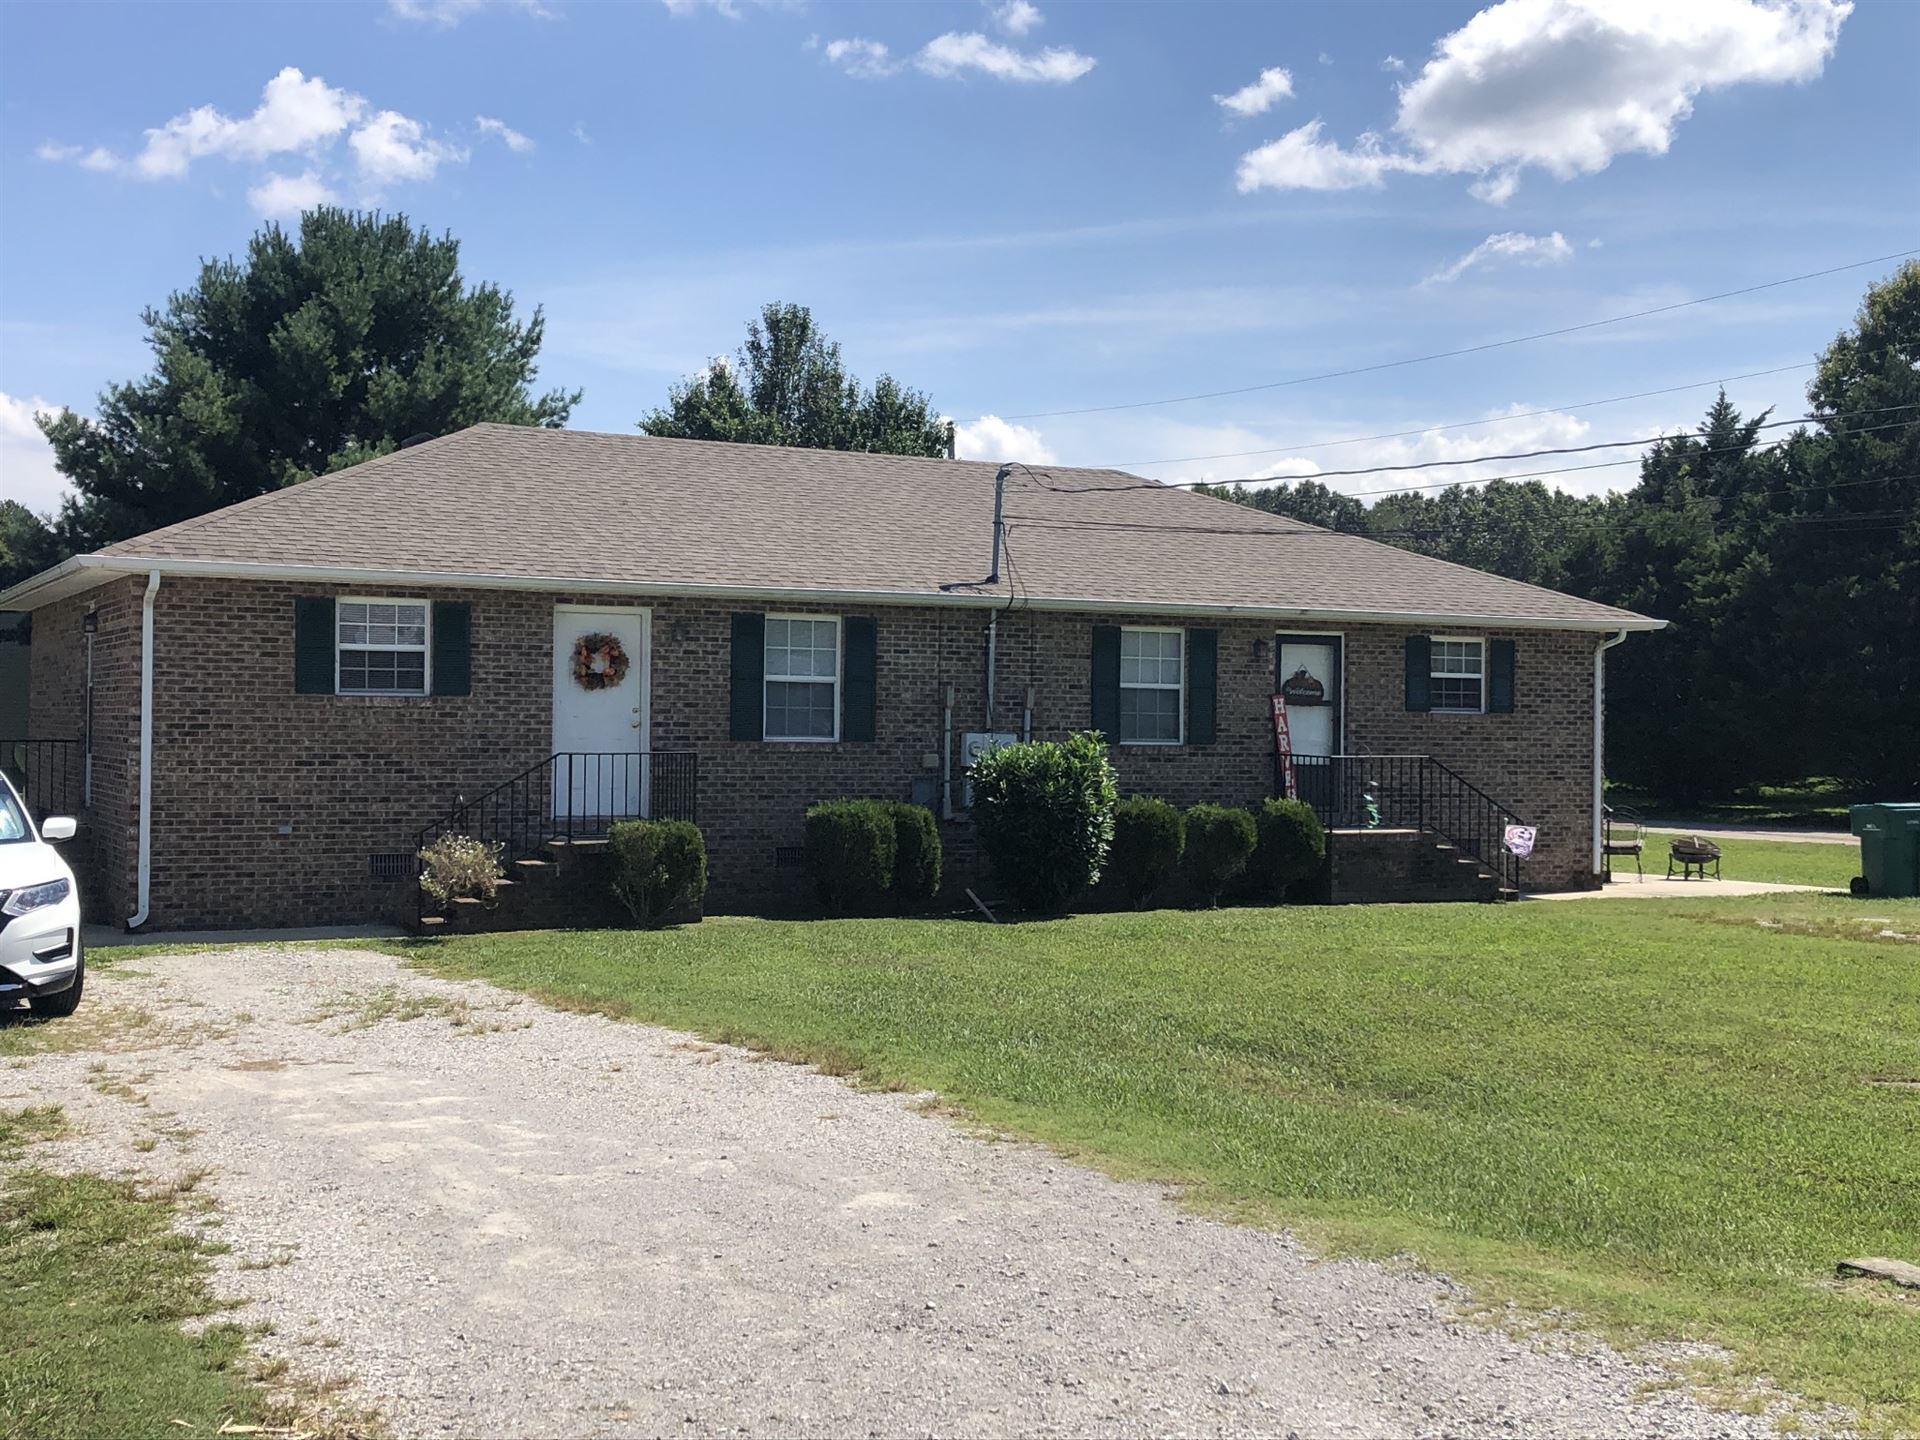 143 Utility Rd, Winchester, TN 37398 - MLS#: 2289429